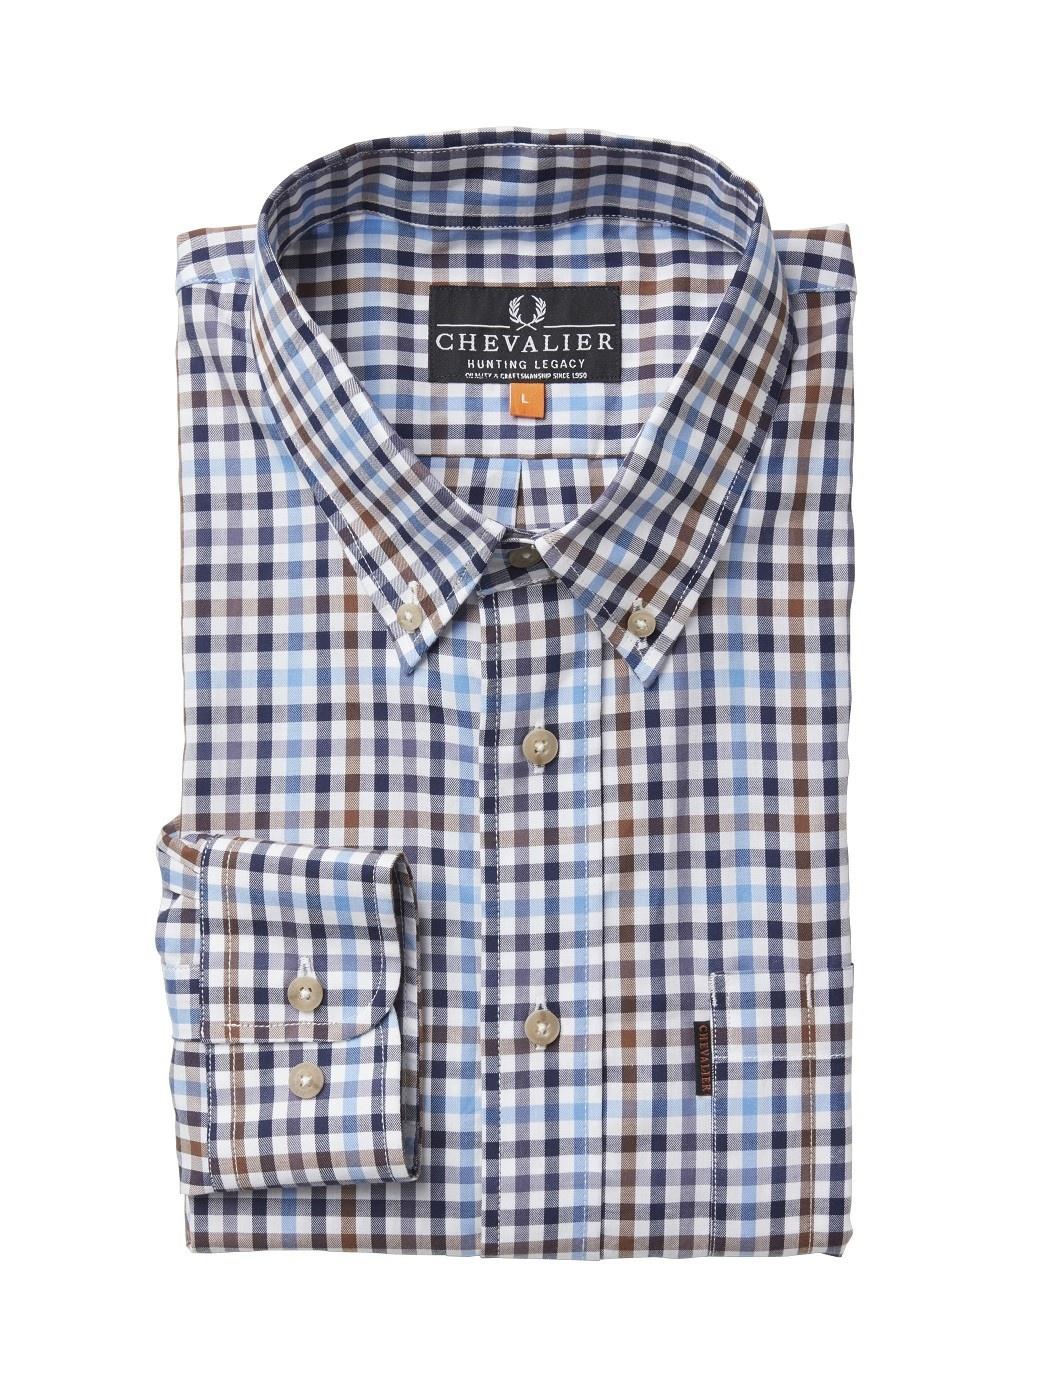 Chevalier Riley Cotton Twill Shirt BD LS Check-1